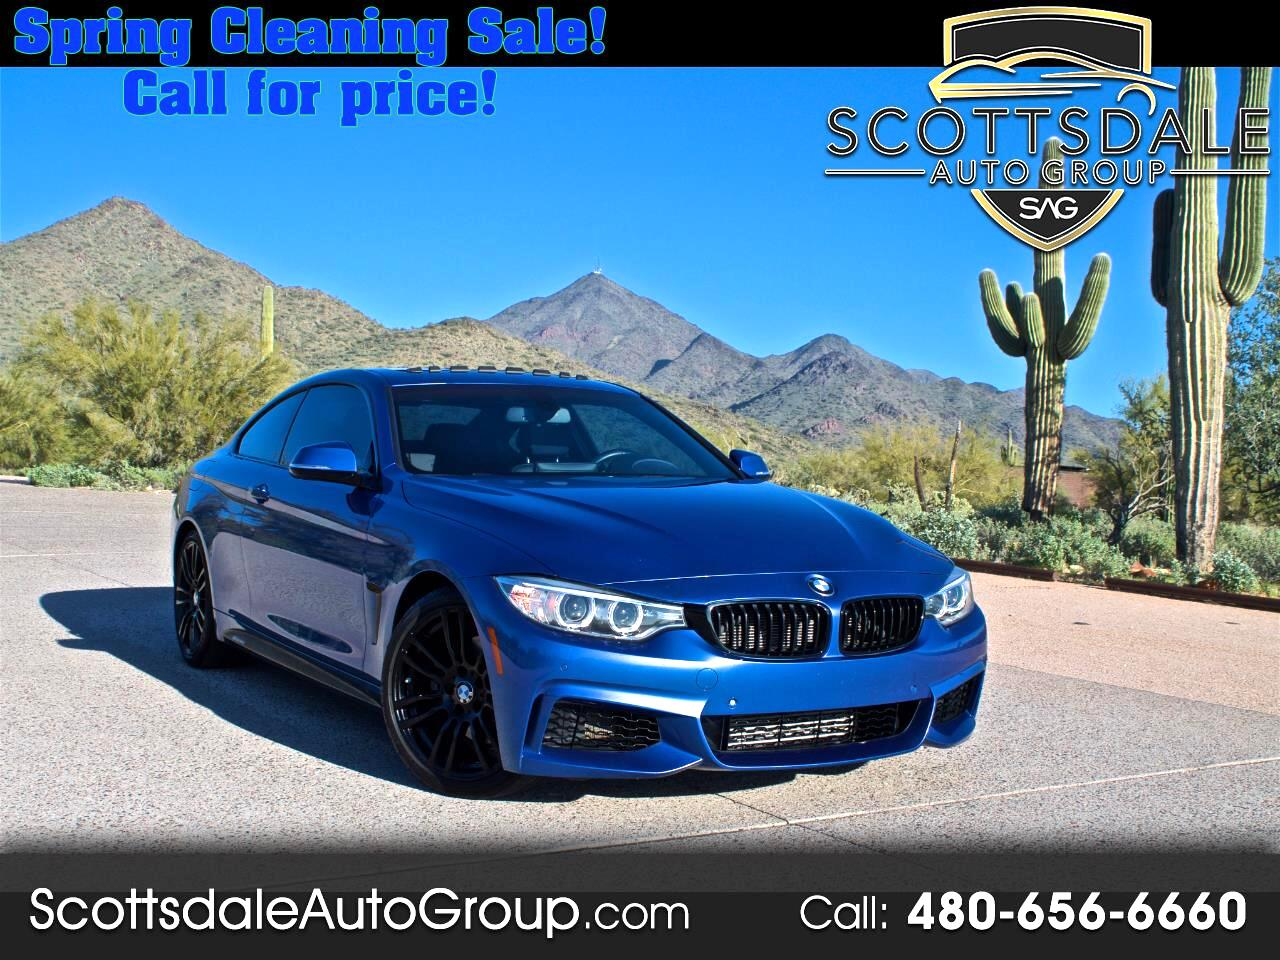 BMW 4 Series 2dr Cpe 428i RWD 2015